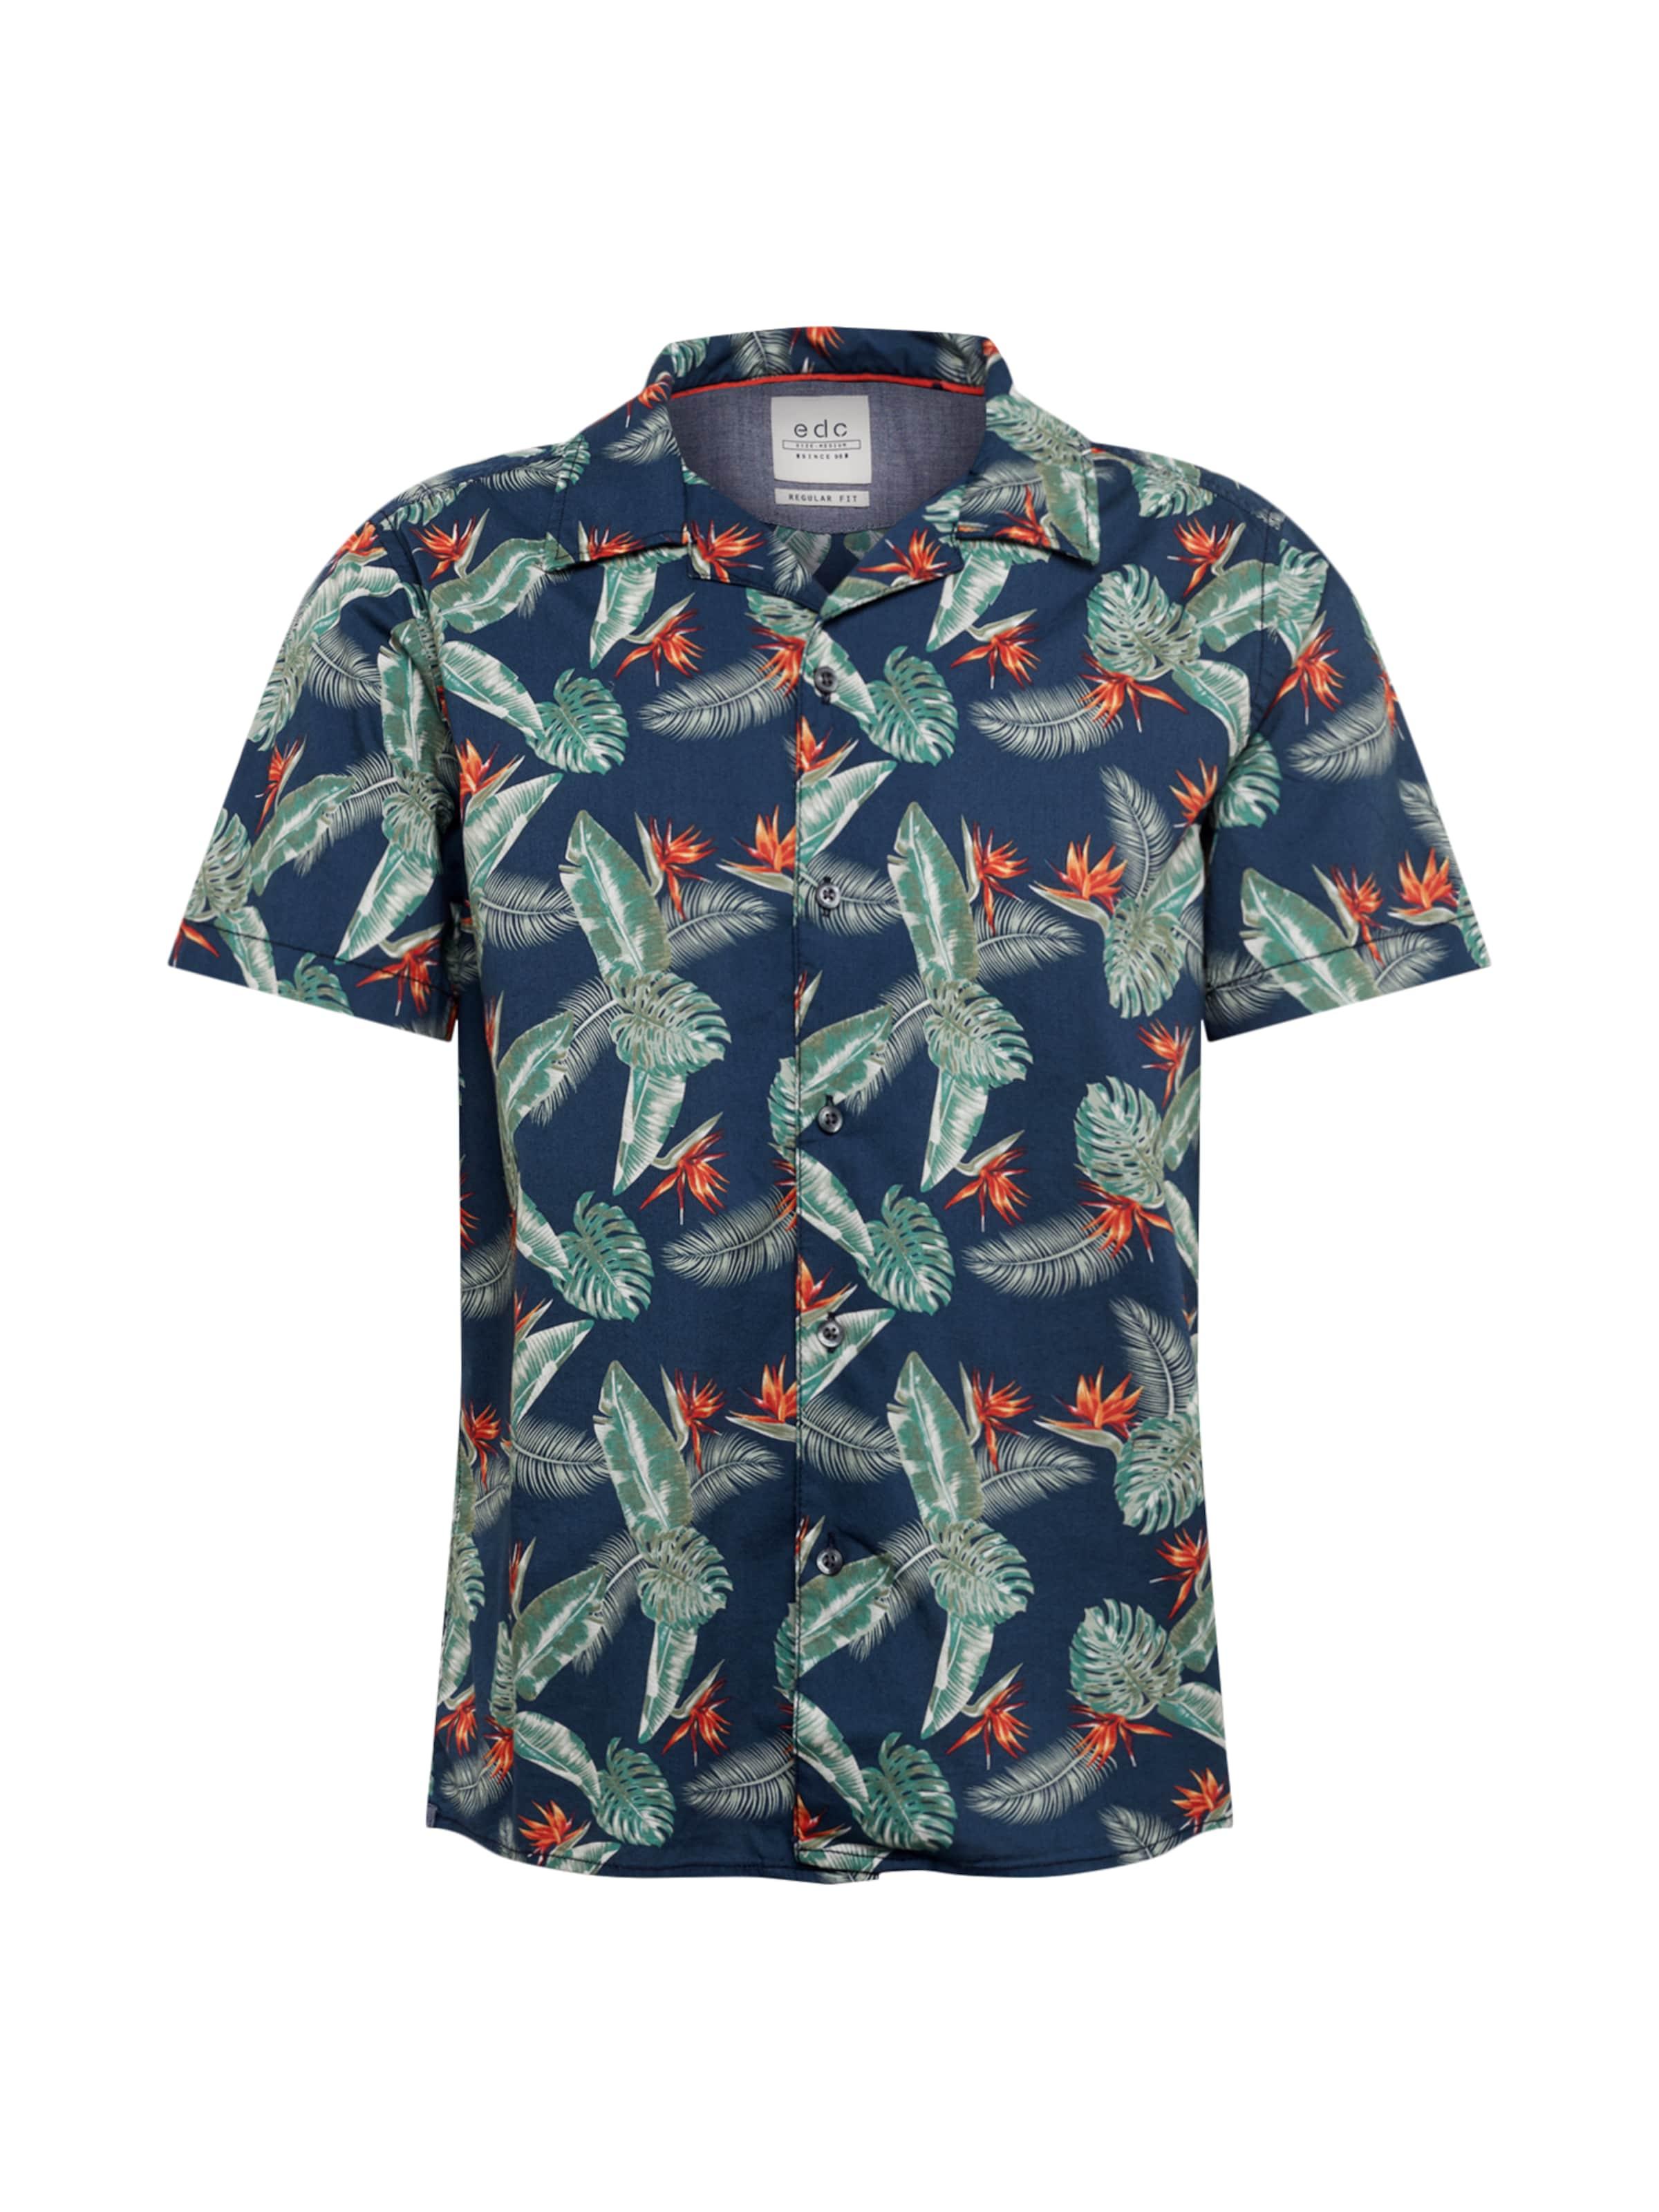 'hawaii' Edc Esprit In By Hemd MarineMischfarben KJuF3Tl5c1